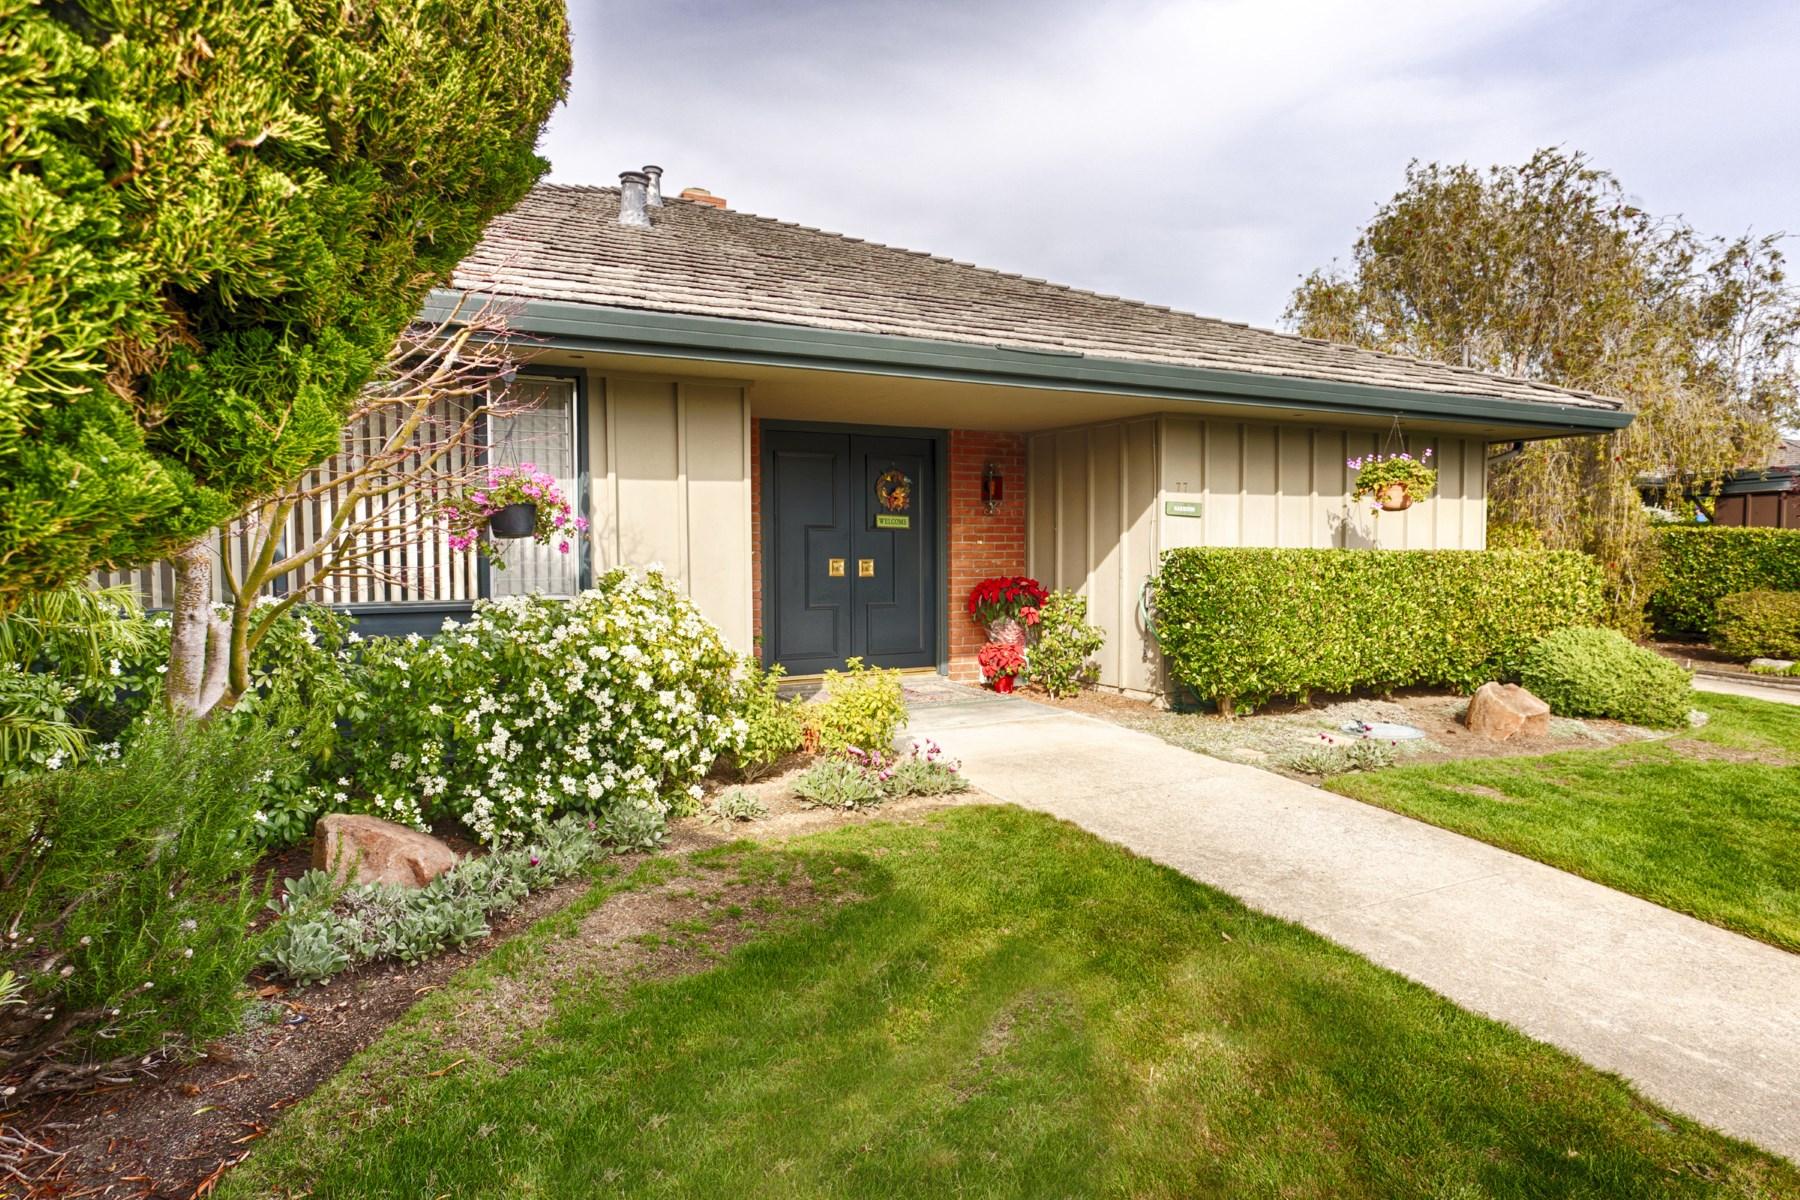 Condominium for Sale at Ultimate Convenience at Del Mesa Carmel 77 Del Mesa Carmel Carmel, California 93923 United States